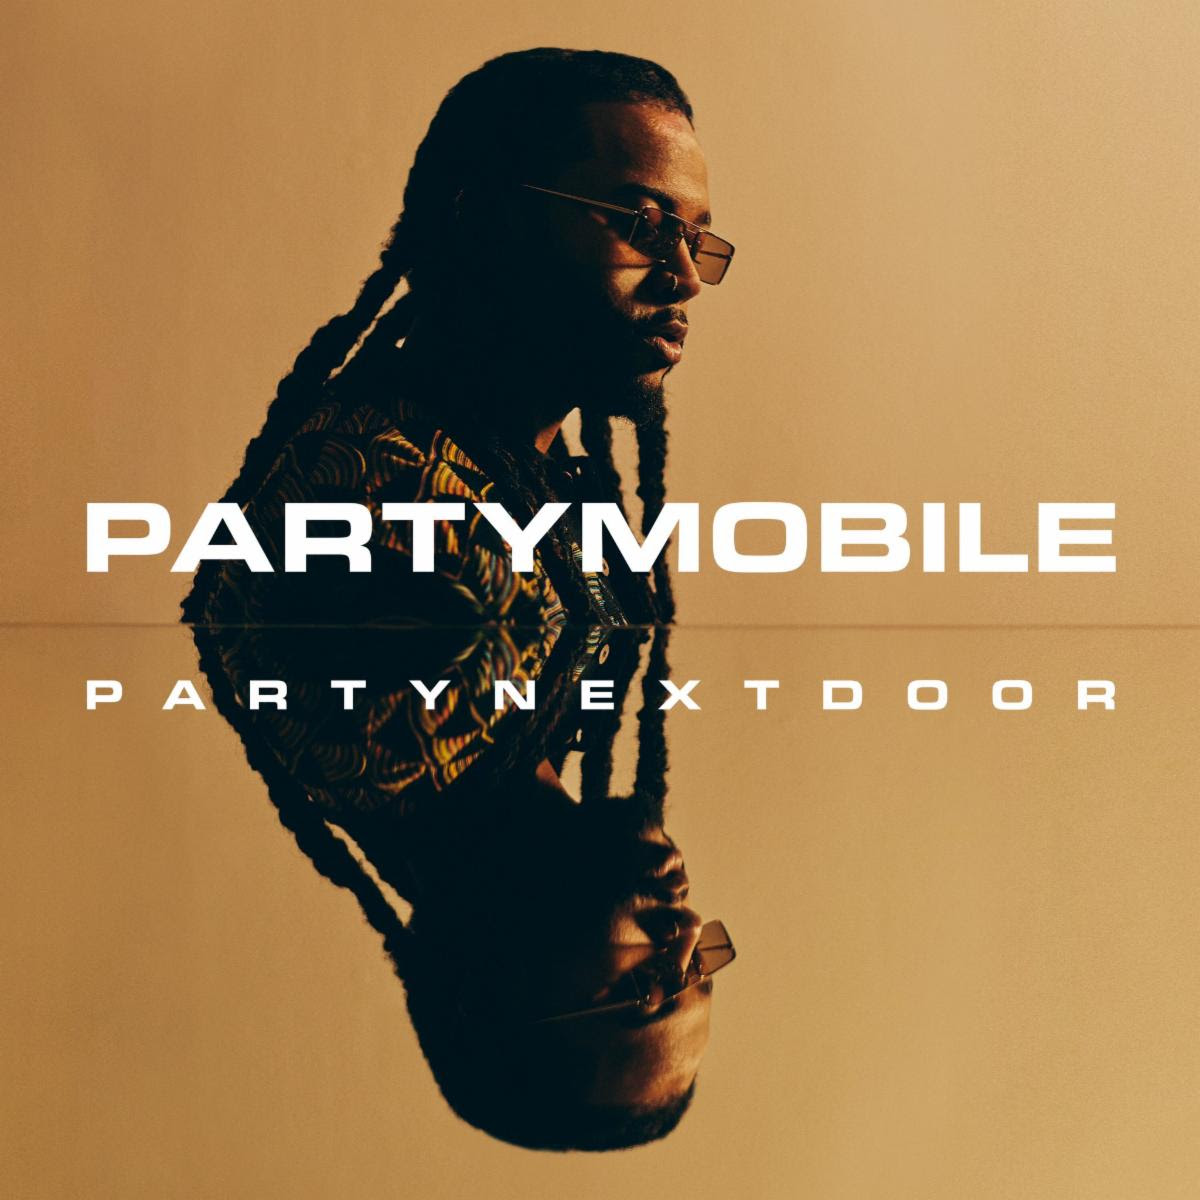 PARTYNEXTDOOR RELEASES NEW 'PARTYMOBILE' ALBUM